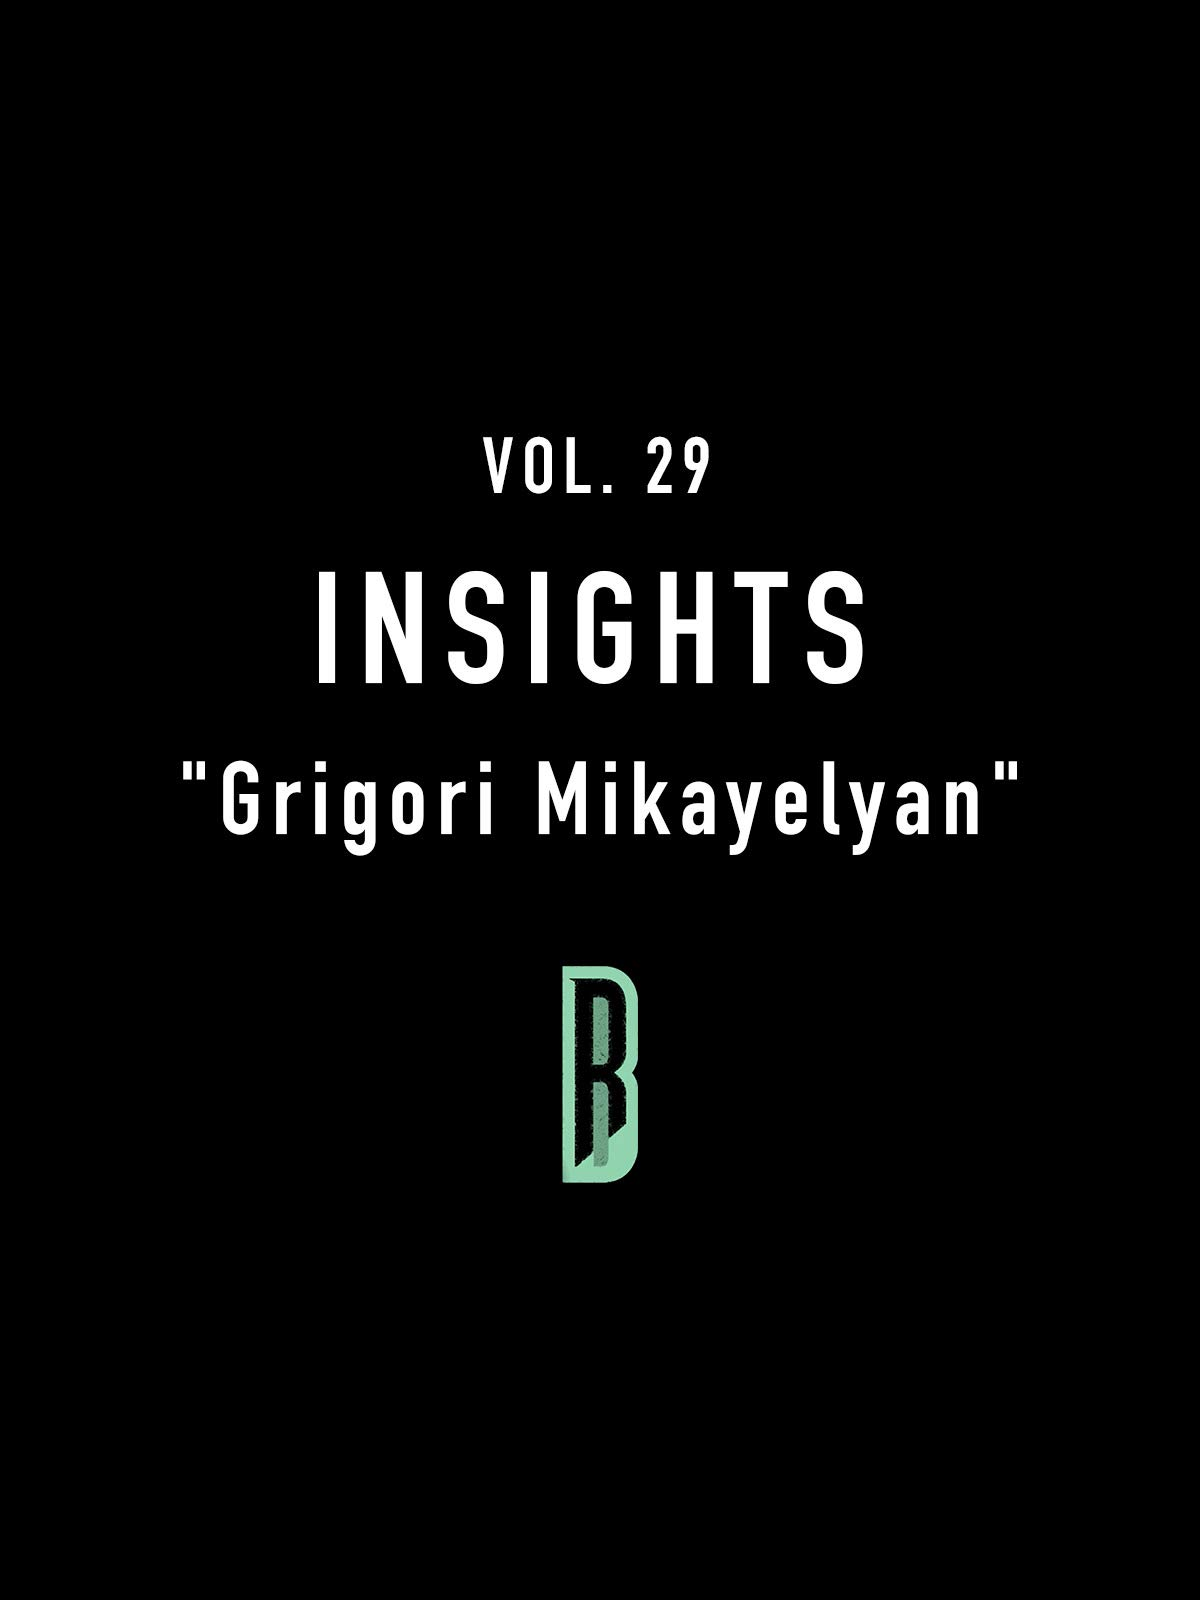 Insights Vol. 29